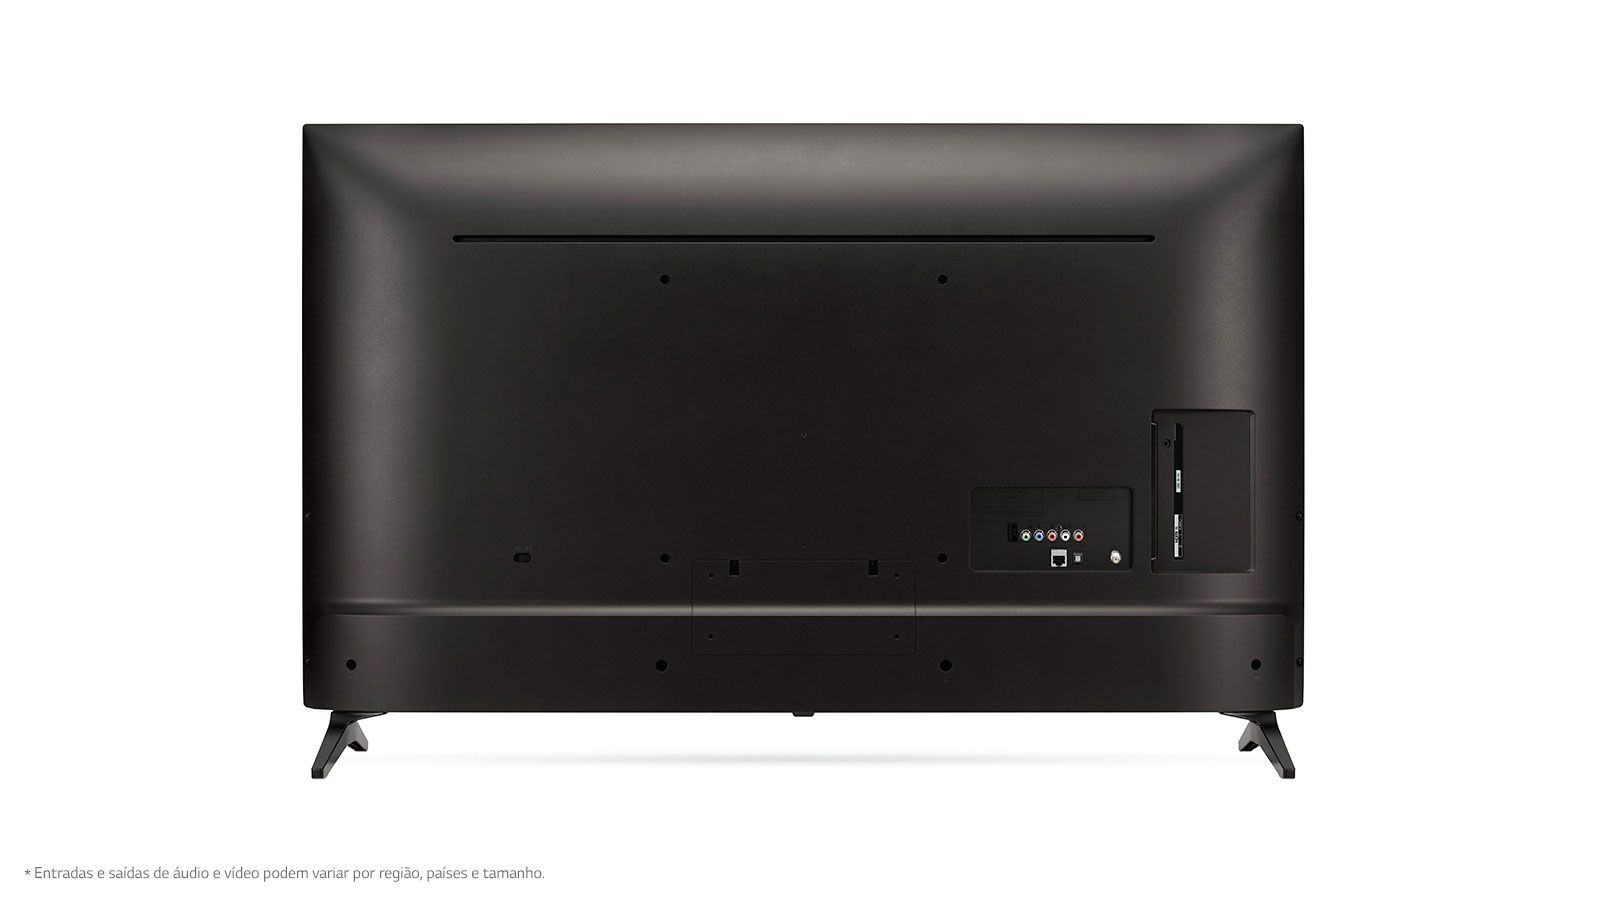 Smart Tv Led 49 Lg Lj5500 Full Hd| Wi-Fi| 2Xhdmi| 1Xusb